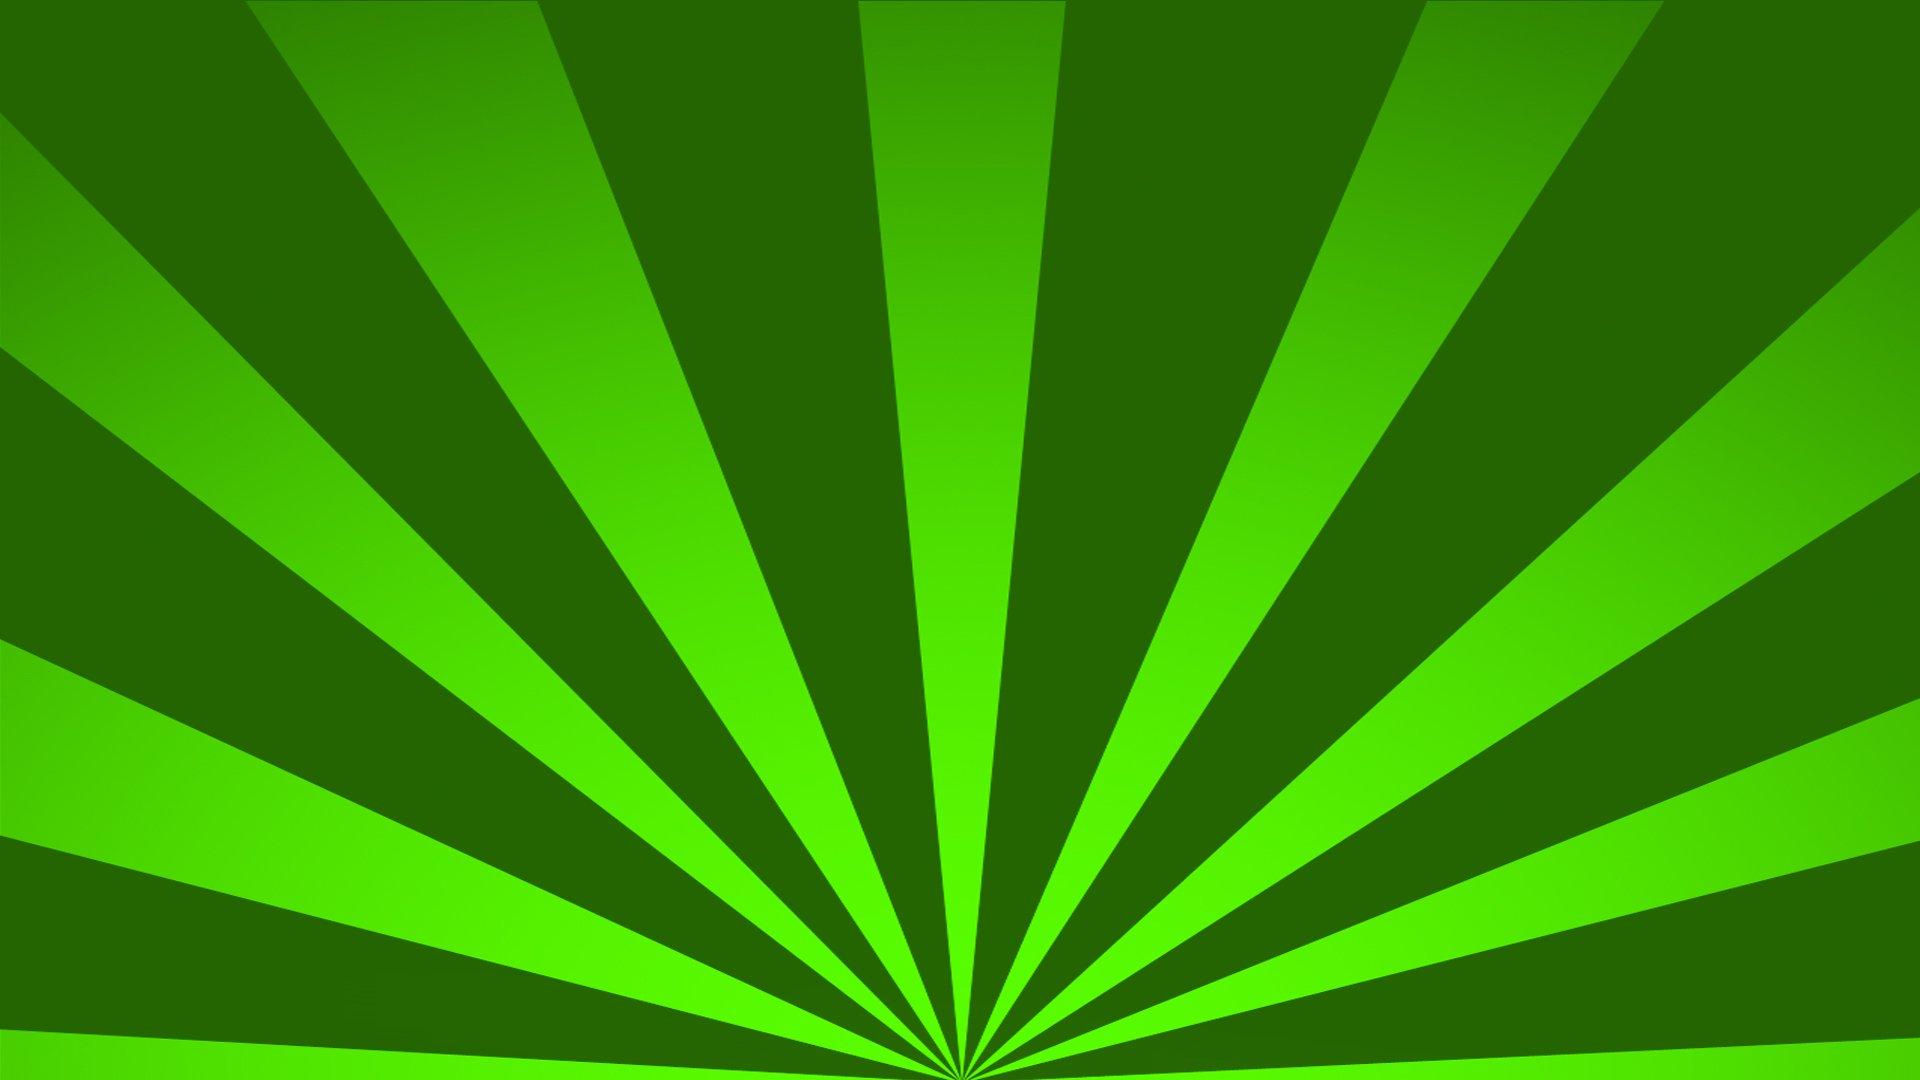 green rays background -#main